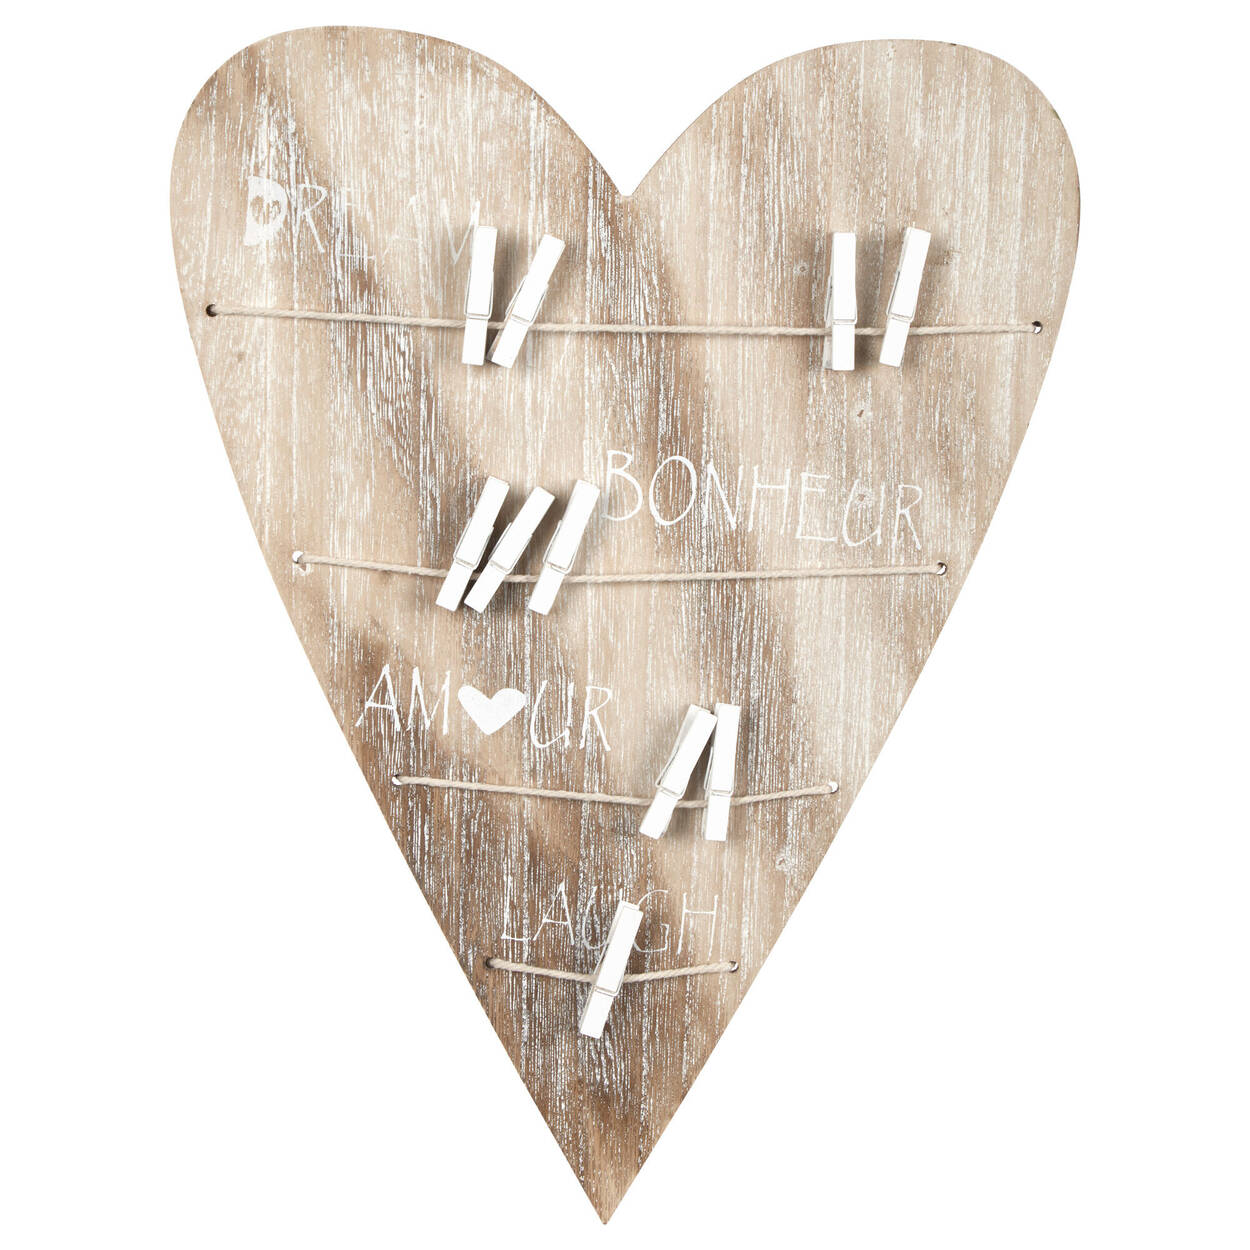 Art mural en forme de coeur avec épingles